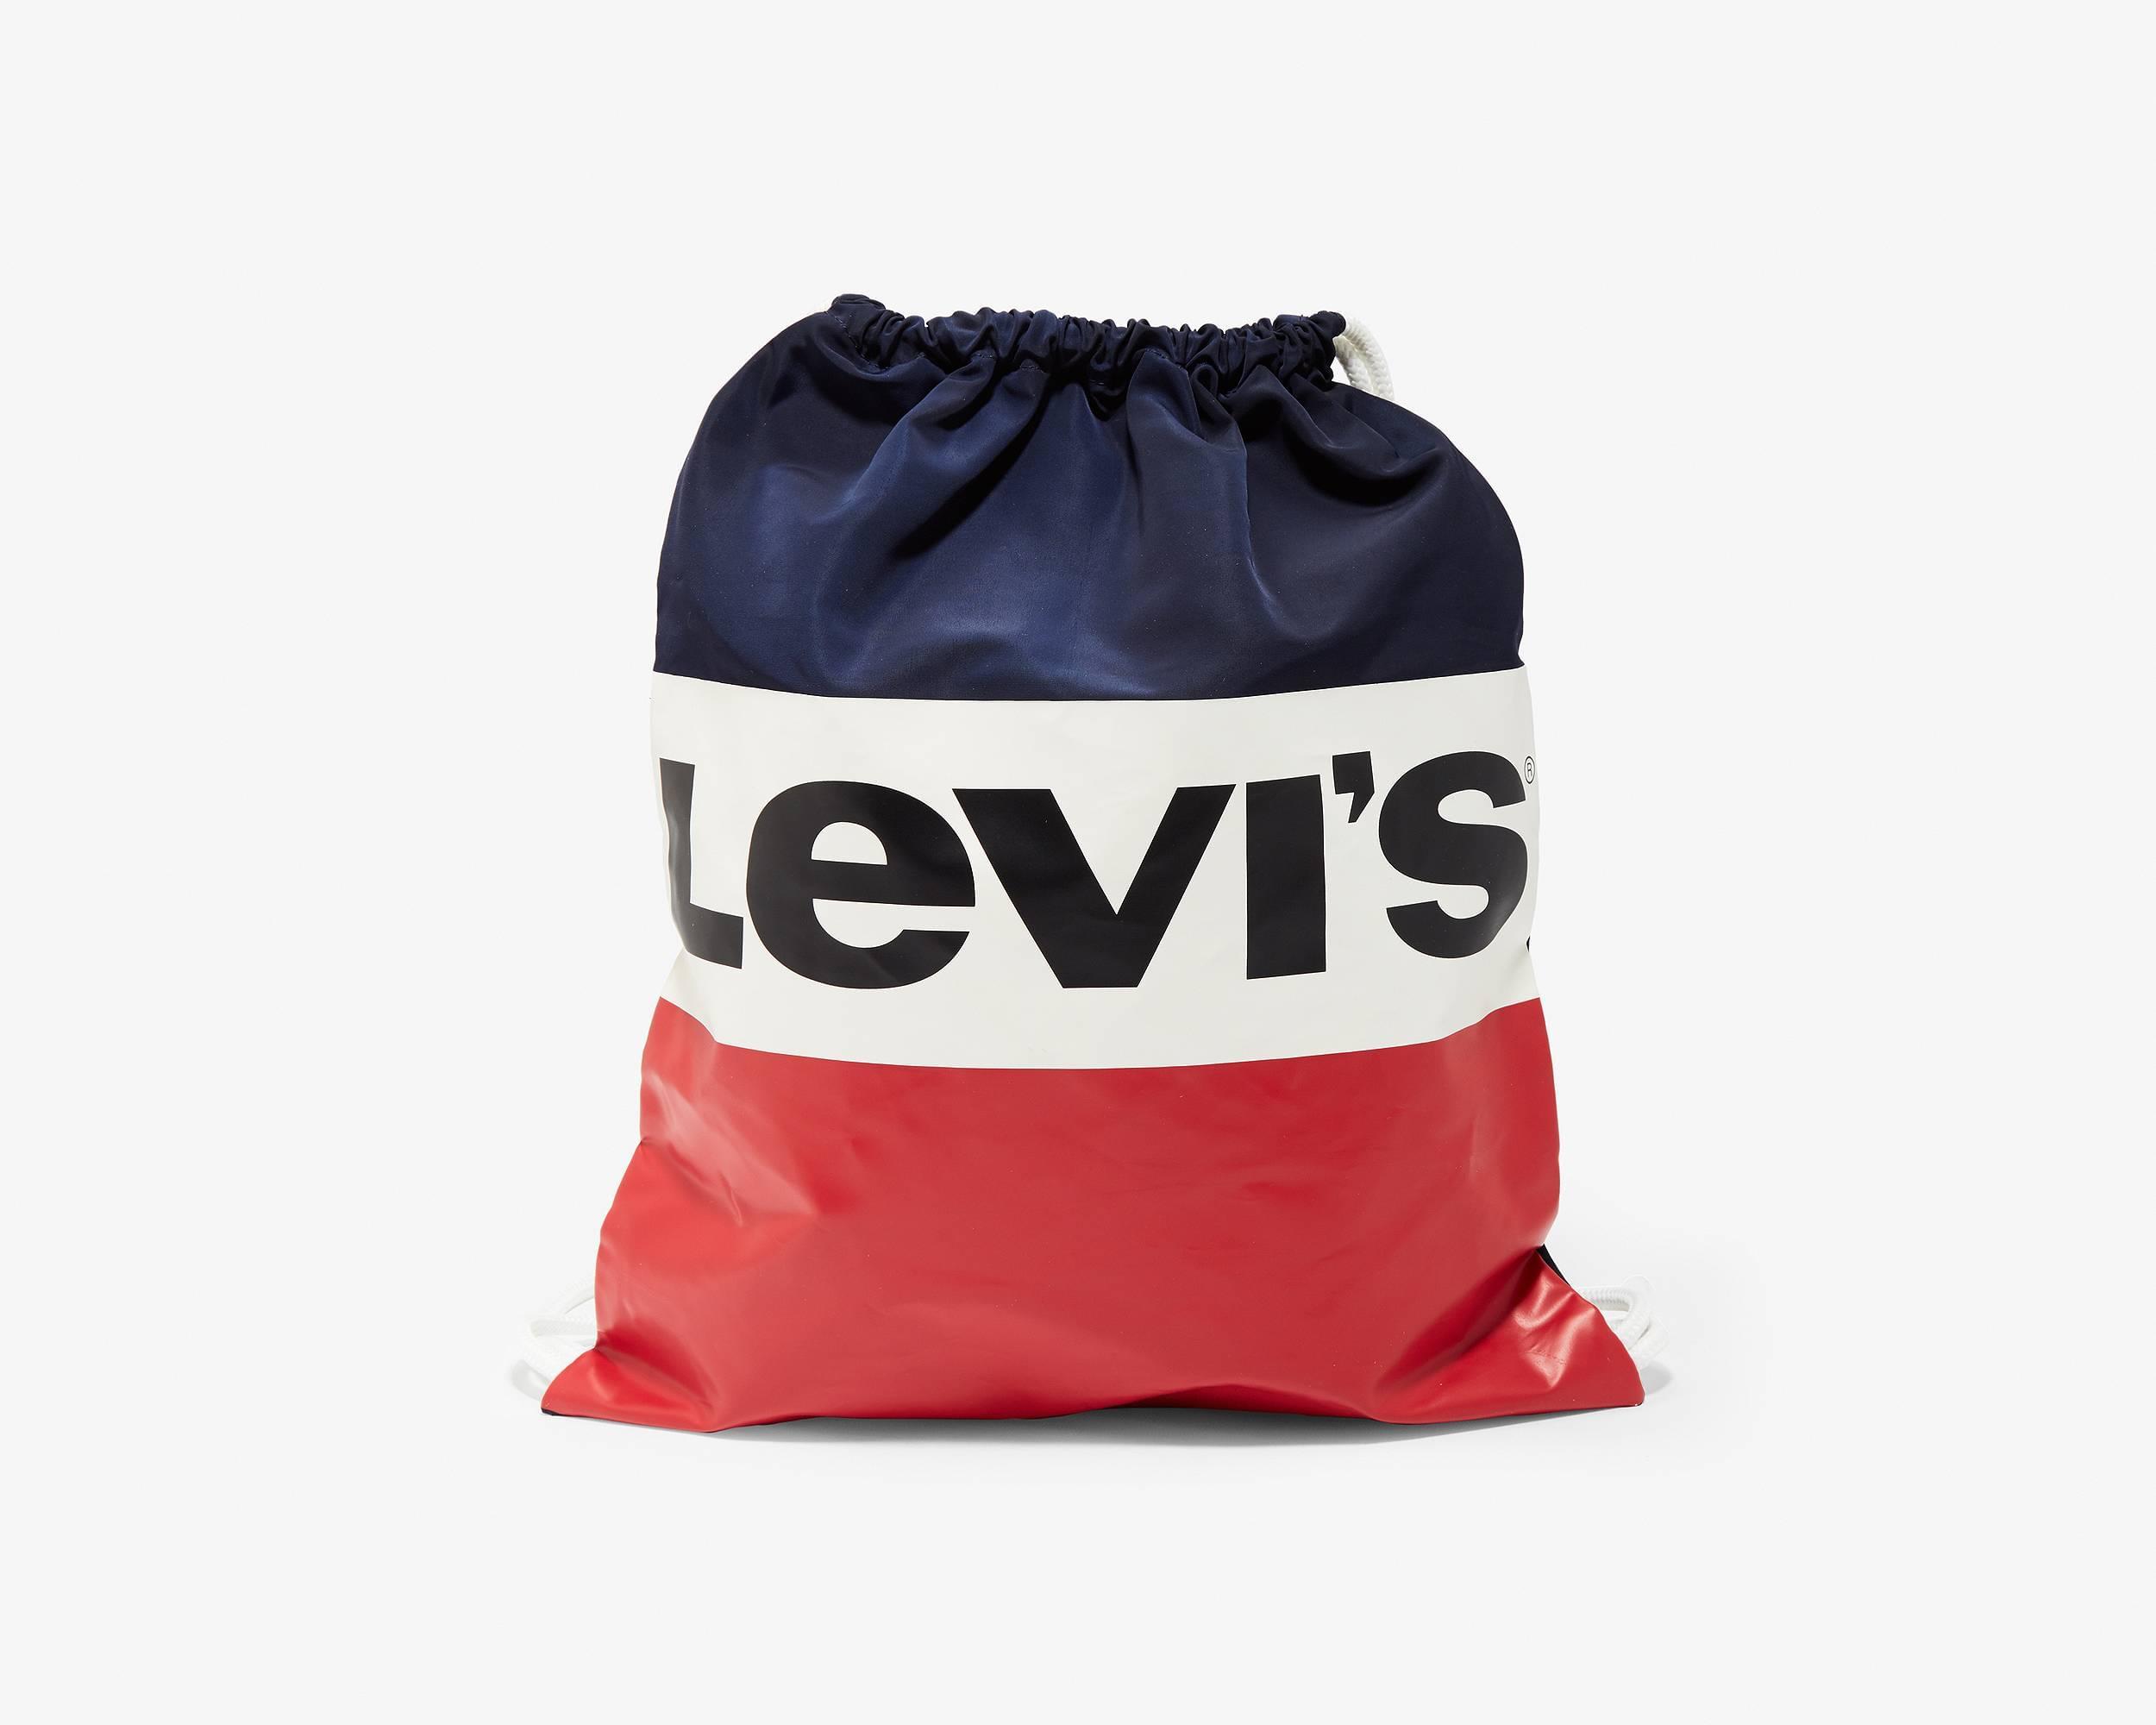 Levi s® Everyday Gym Bag Sportwear - Levi s Jeans 0f324fab178e1